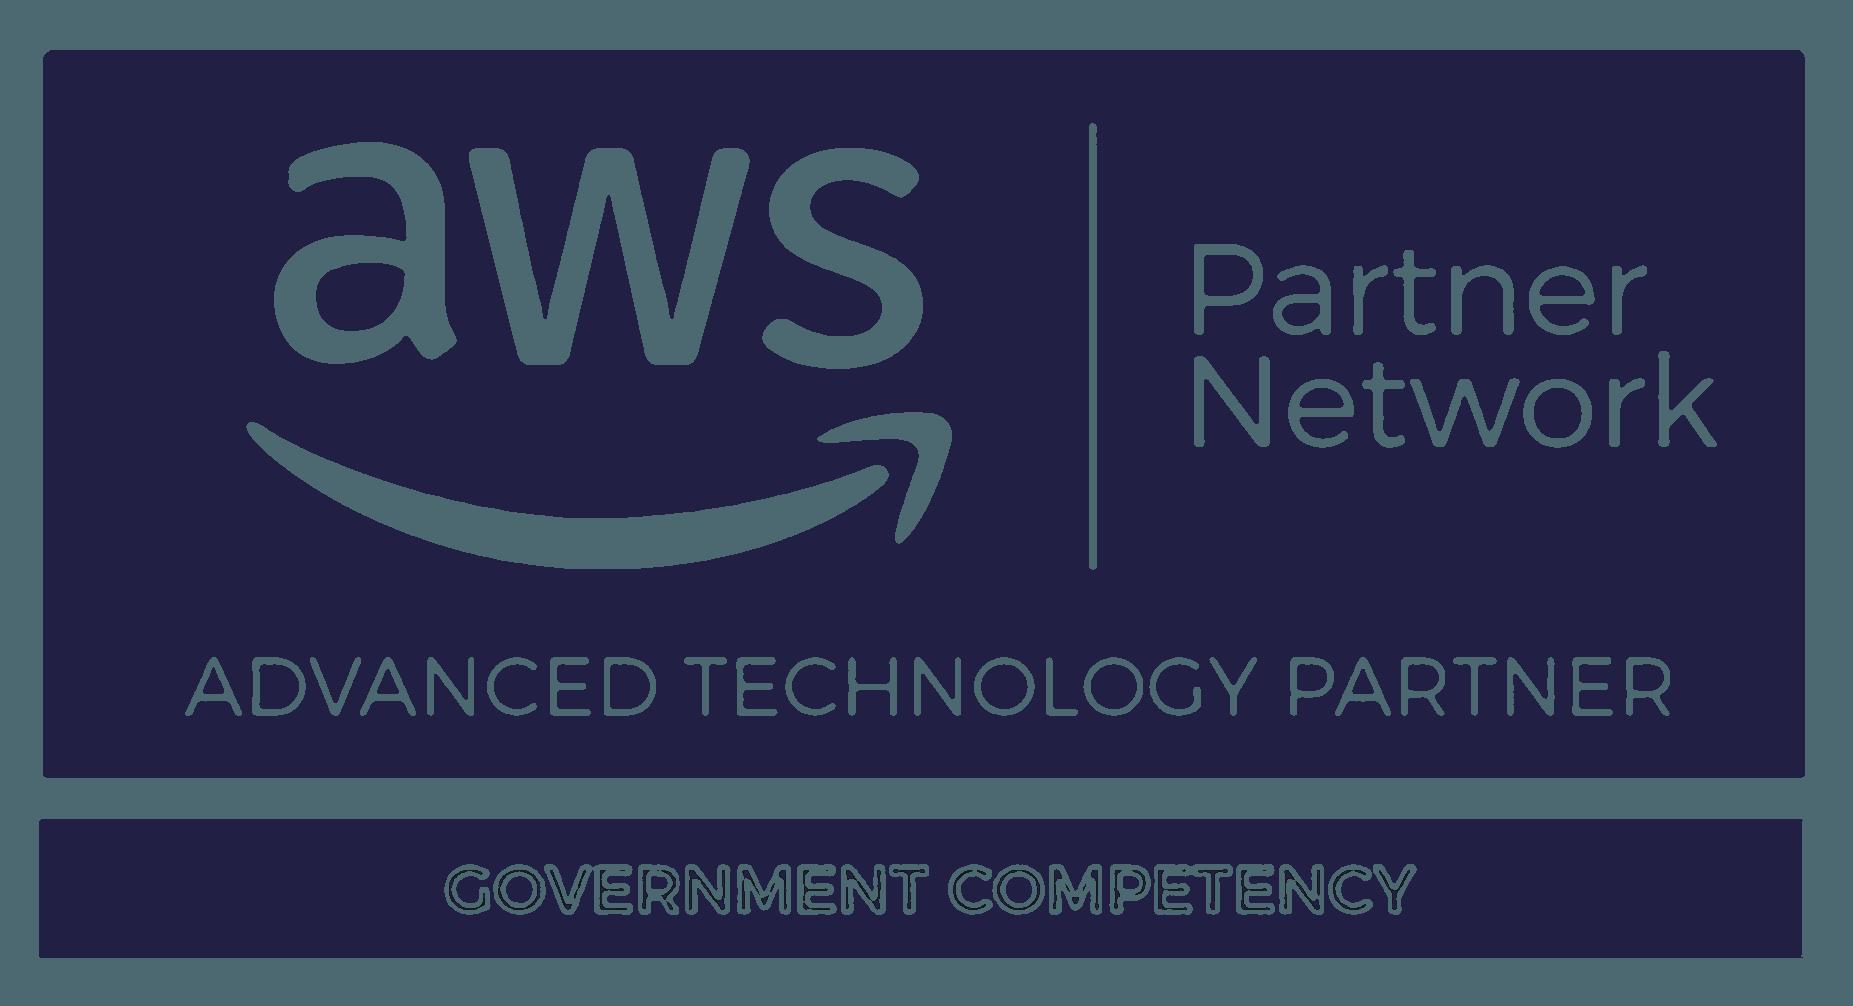 Aws gov competency logo dark blue edit